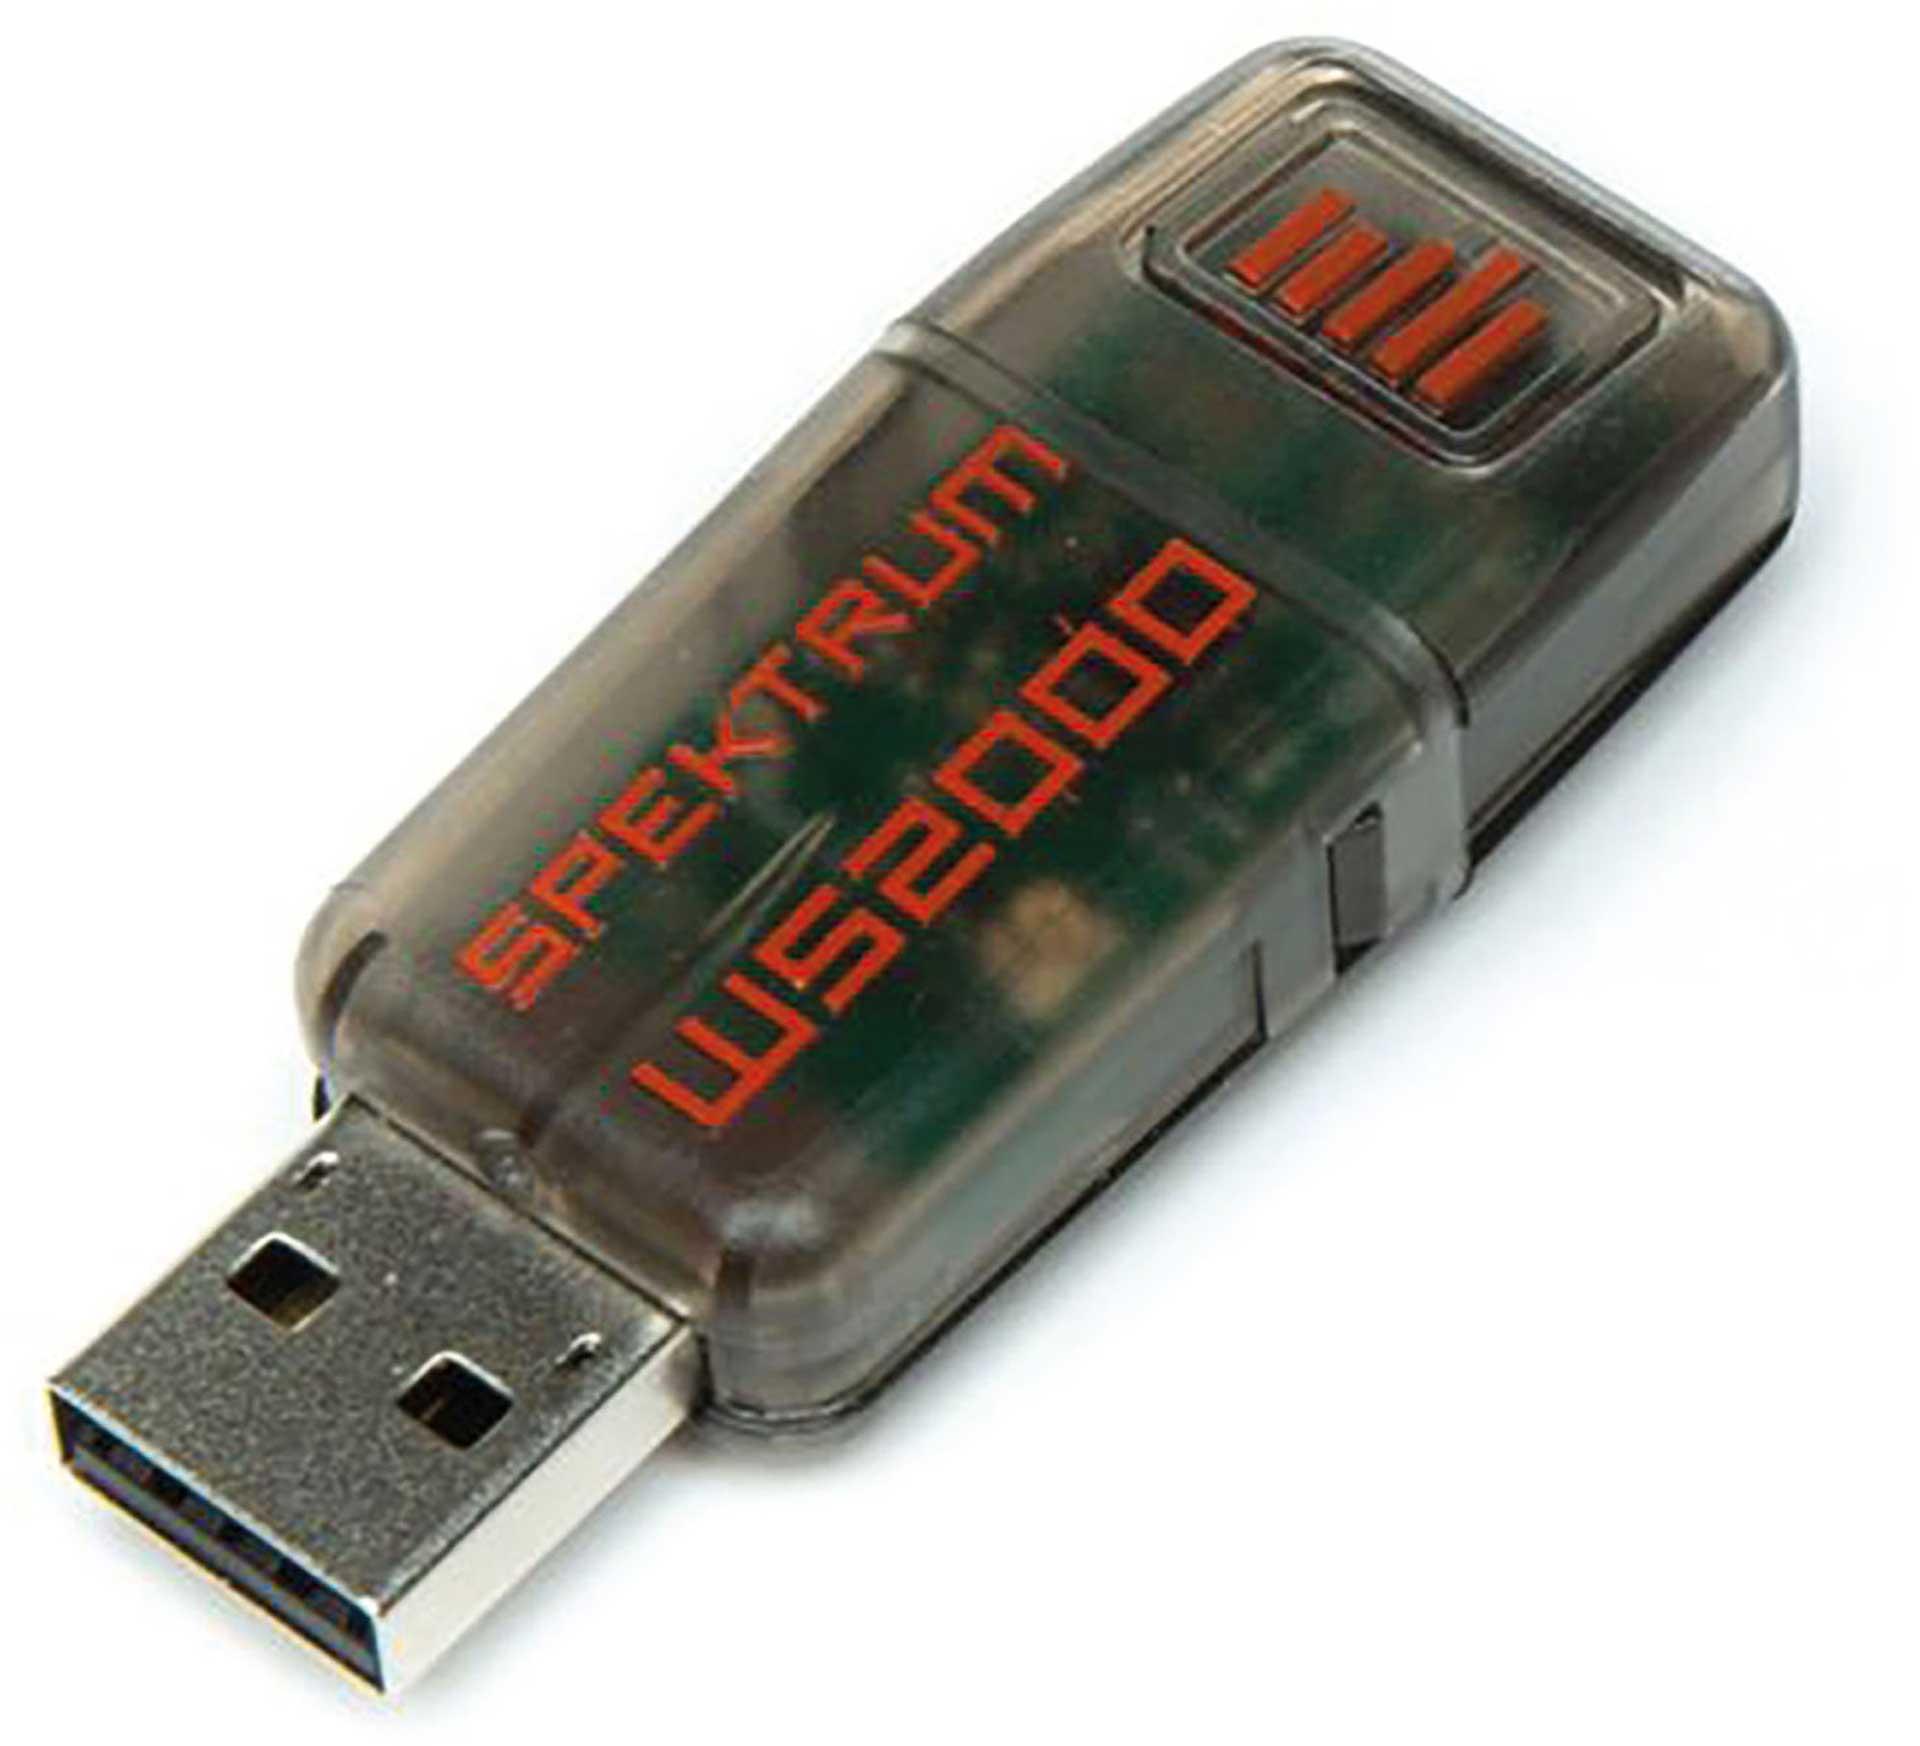 SPEKTRUM WIRELESS SIMULATOR USB DONGLE